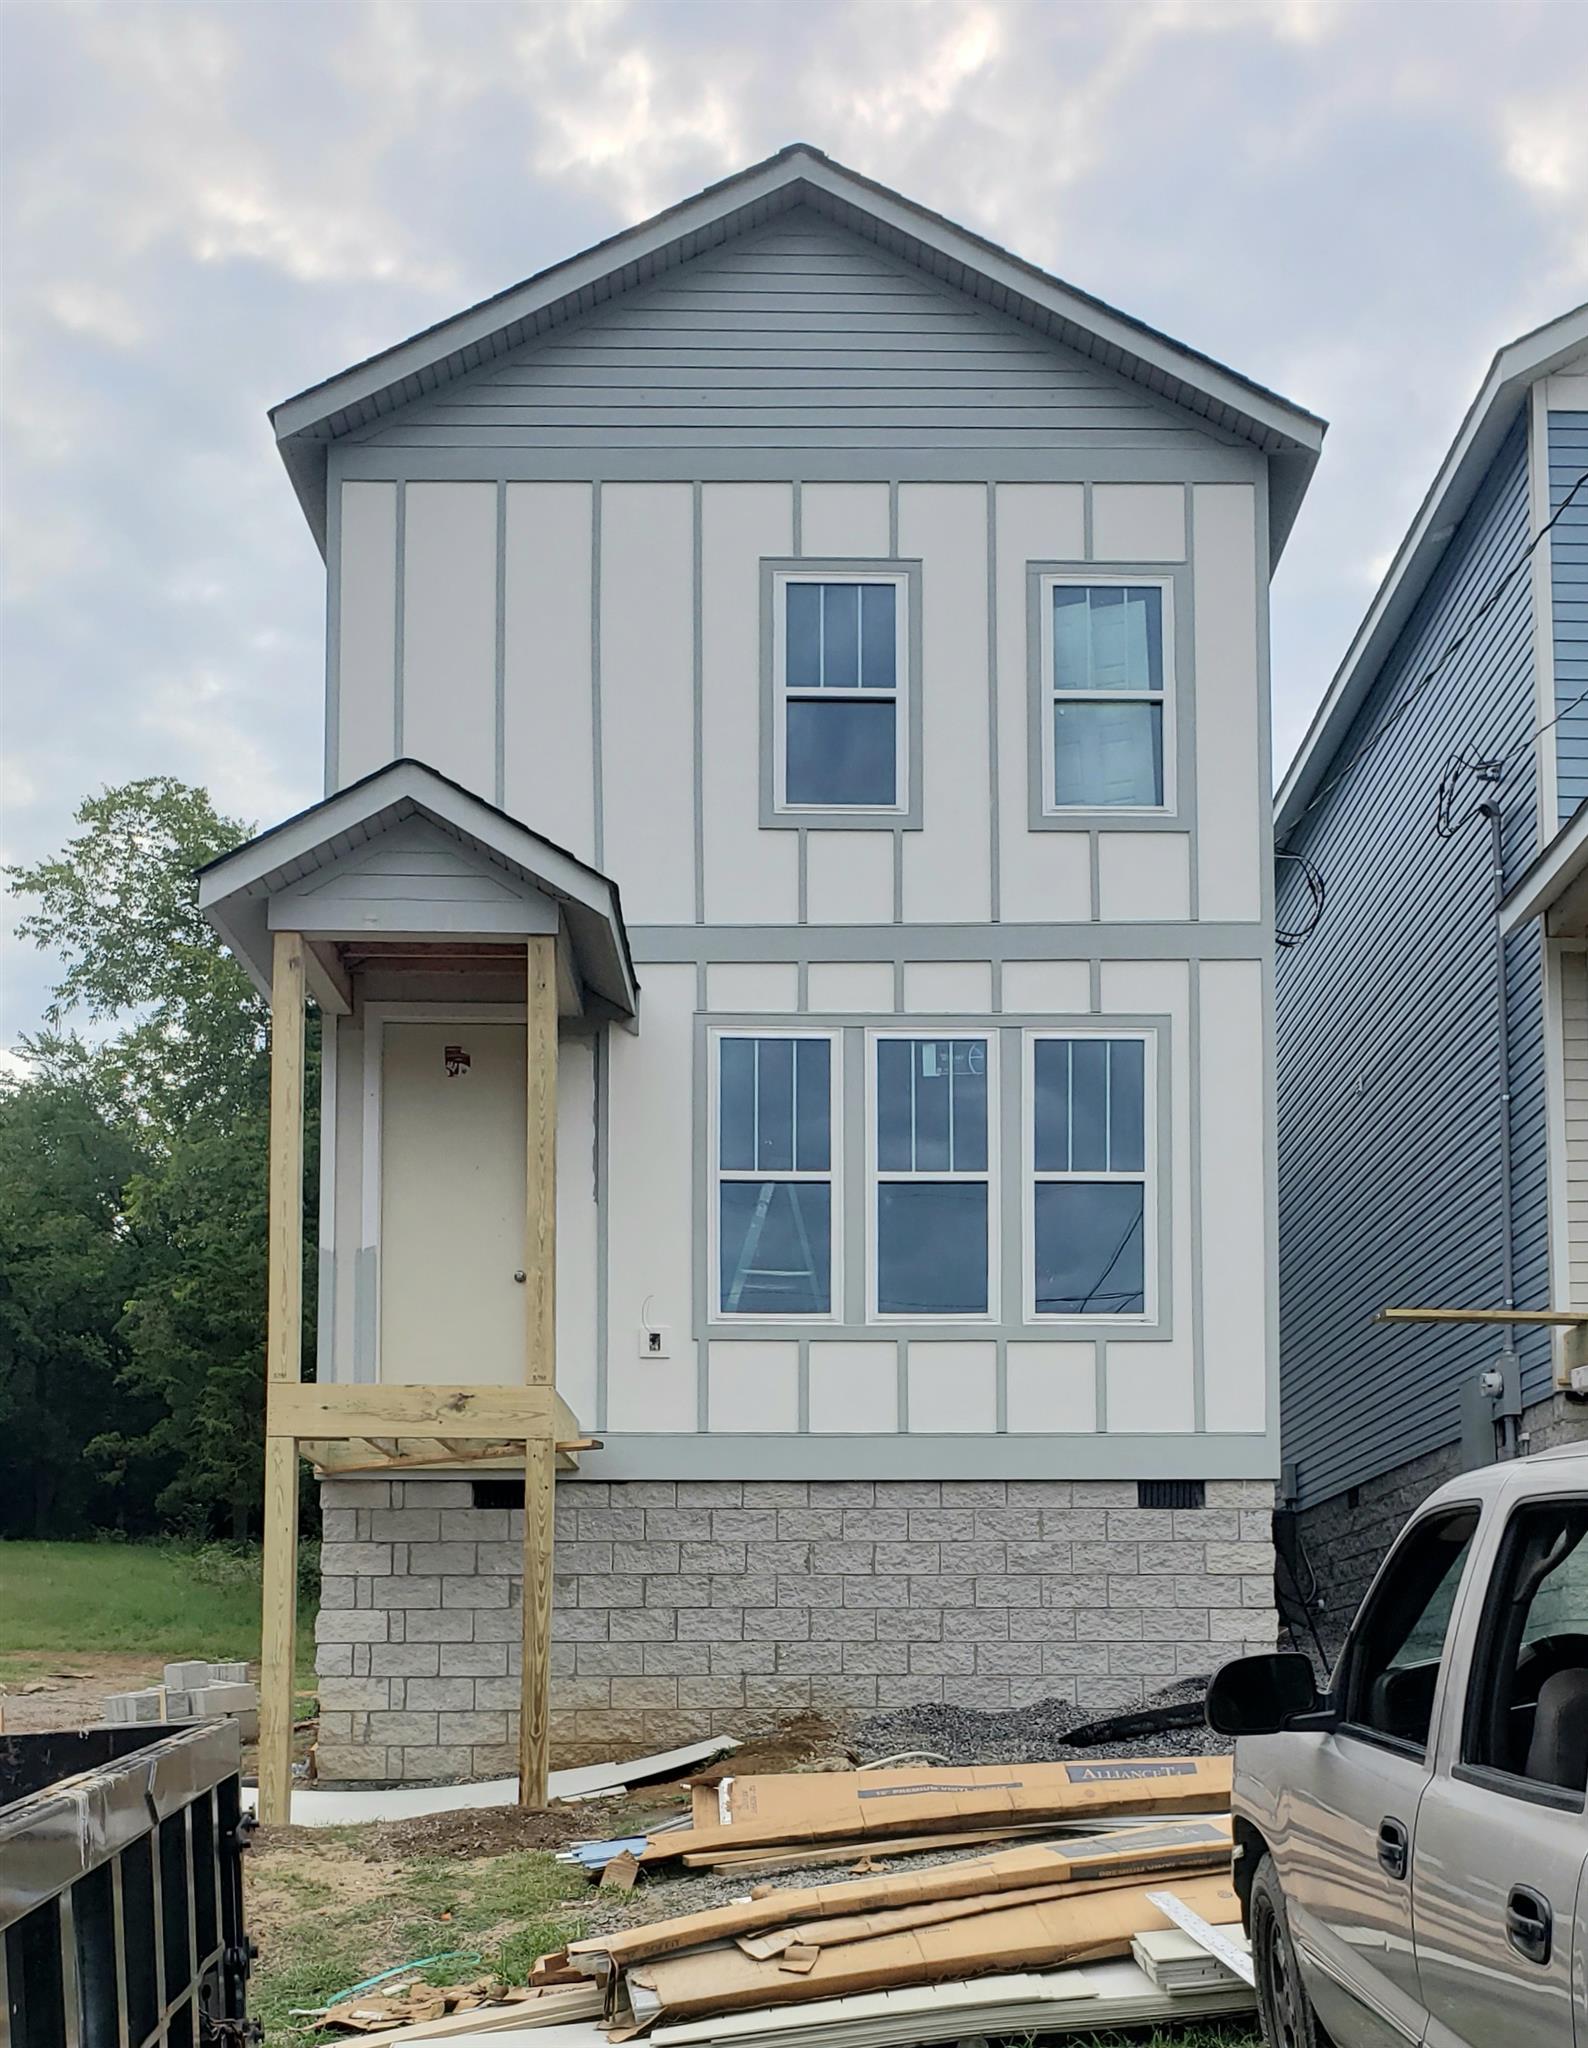 225A Hillcrest Dr, Madison, TN 37115 - Madison, TN real estate listing